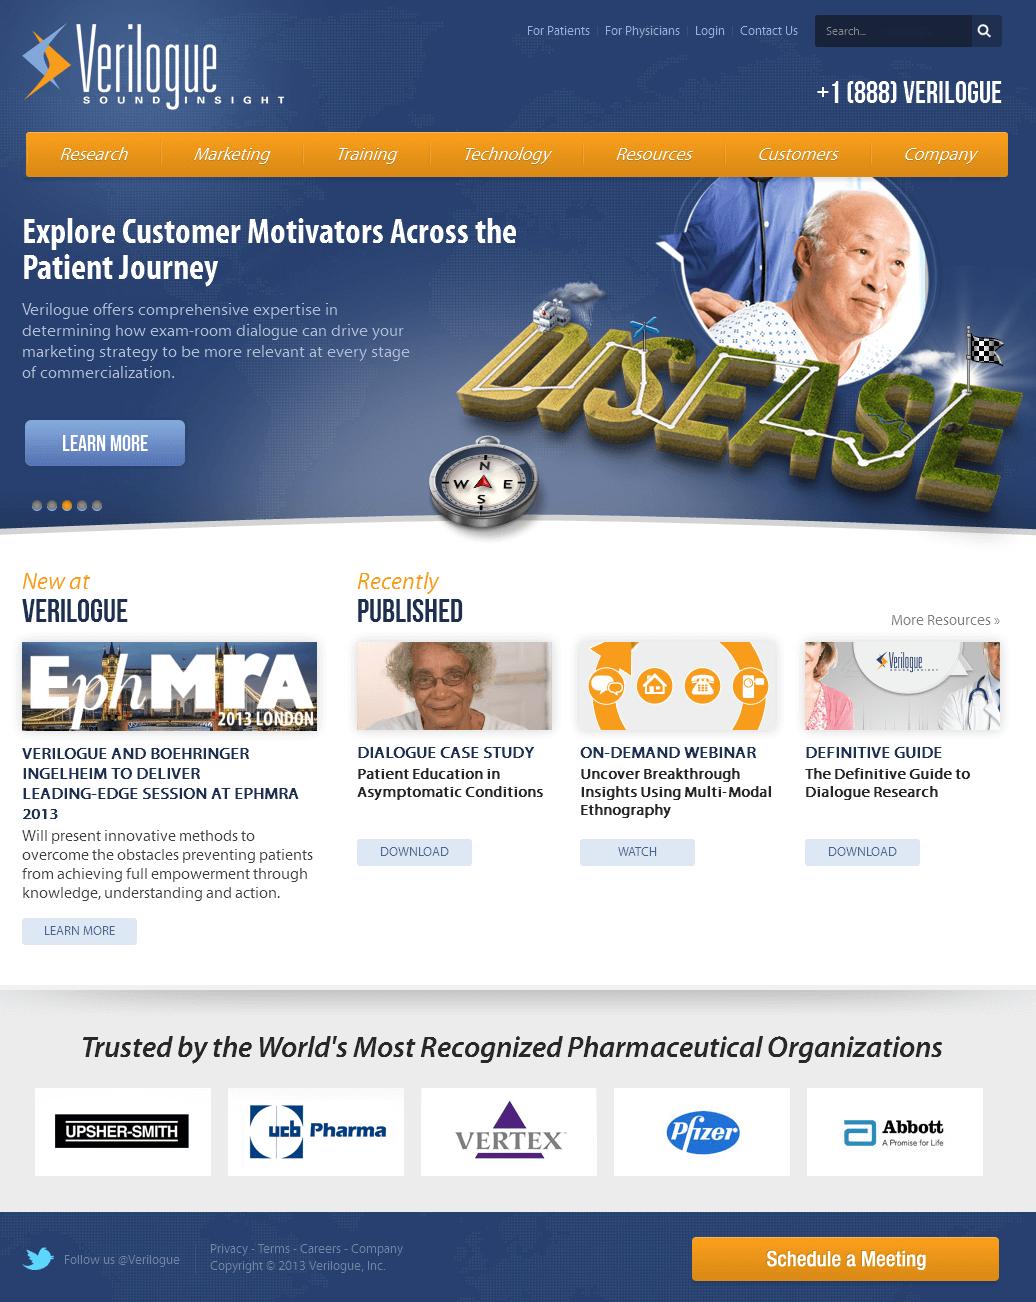 Joomla Powered Communication Platform for Patients & Physicians - Verilogue